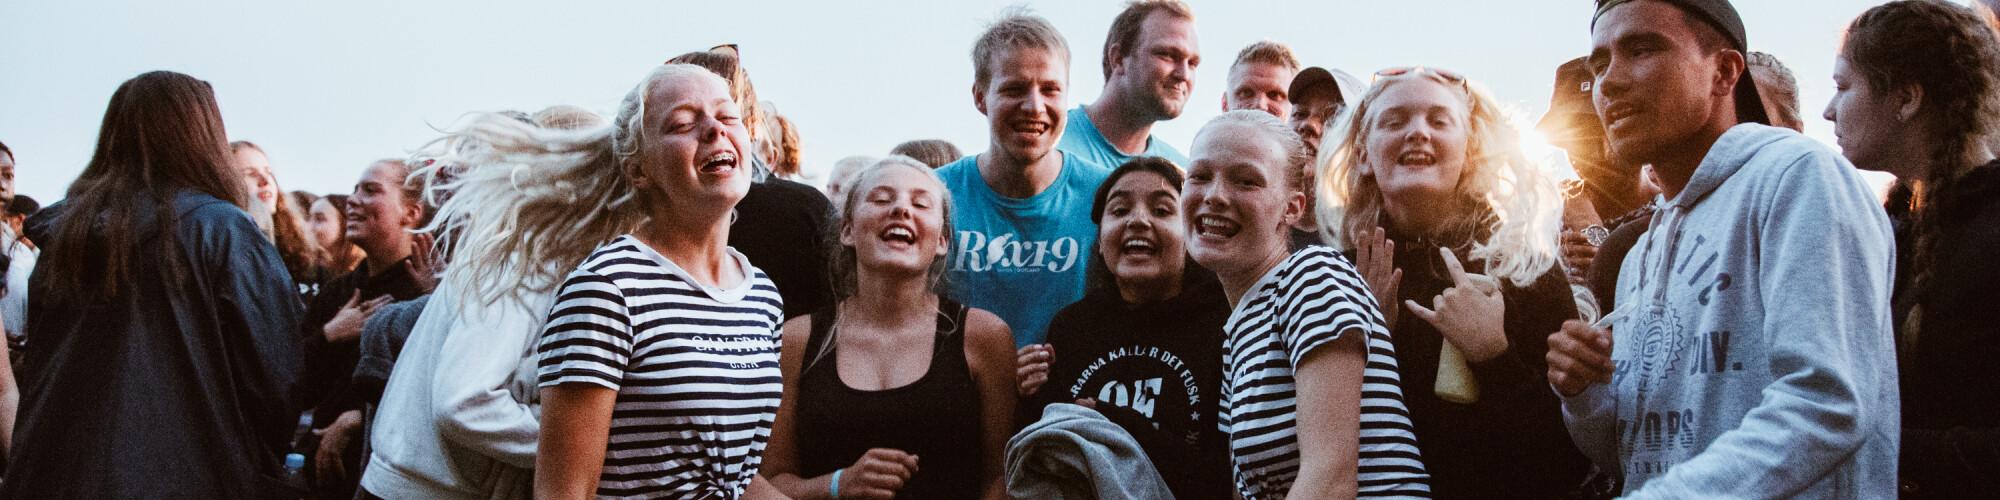 Rix19_Gotland_2019_Alma_Bengtsson_198_web